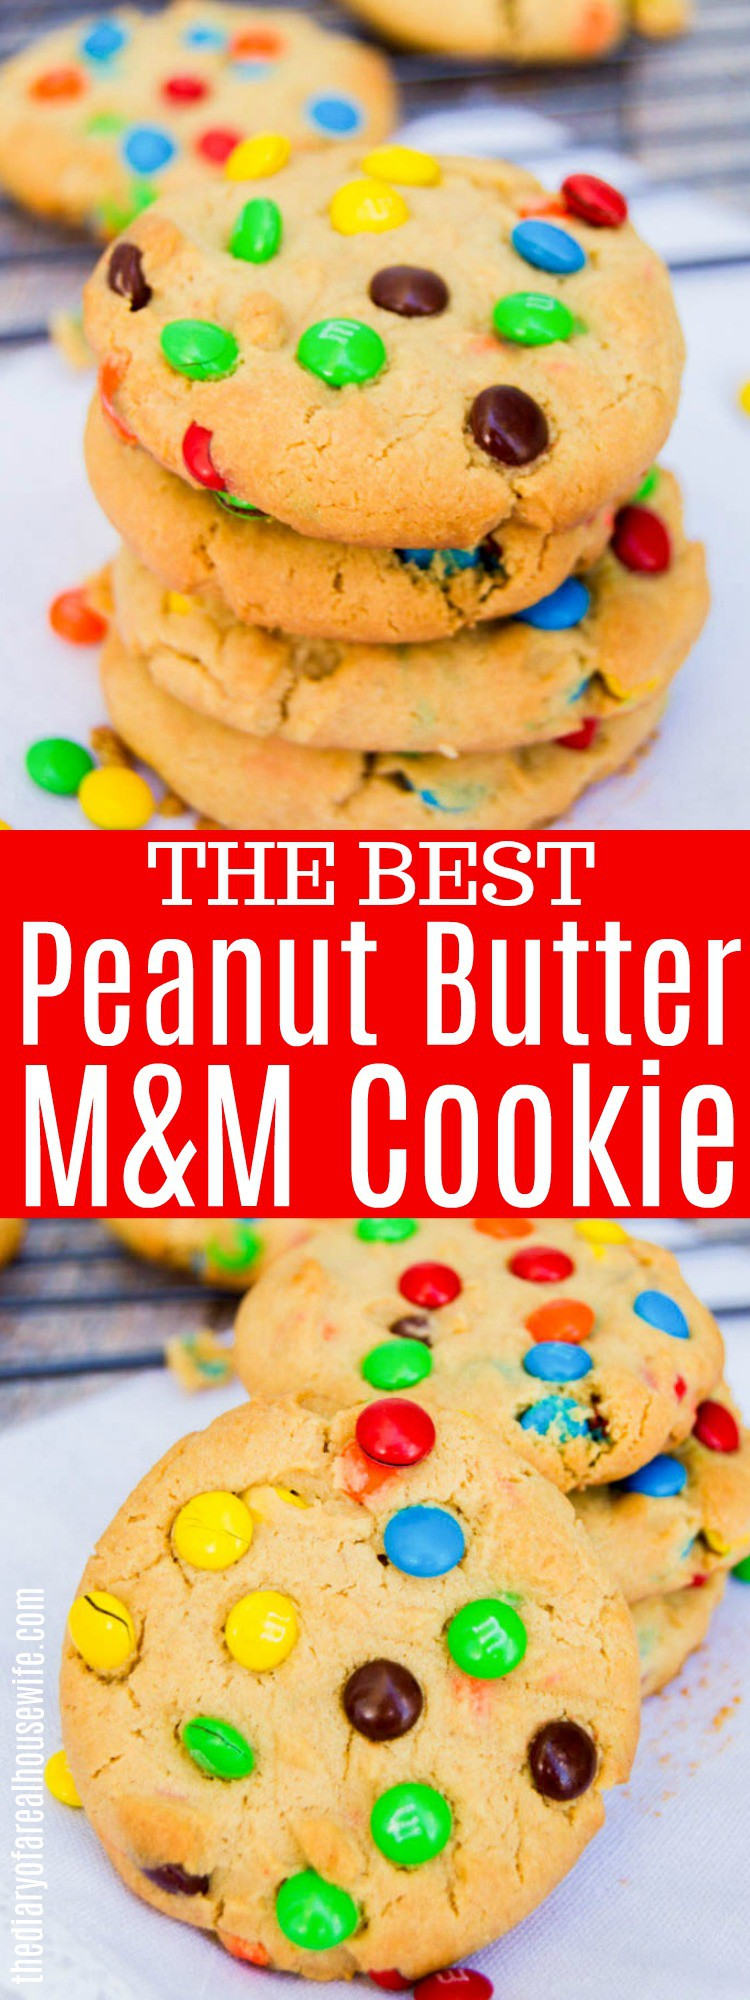 Peanut Butter M&M Cookie